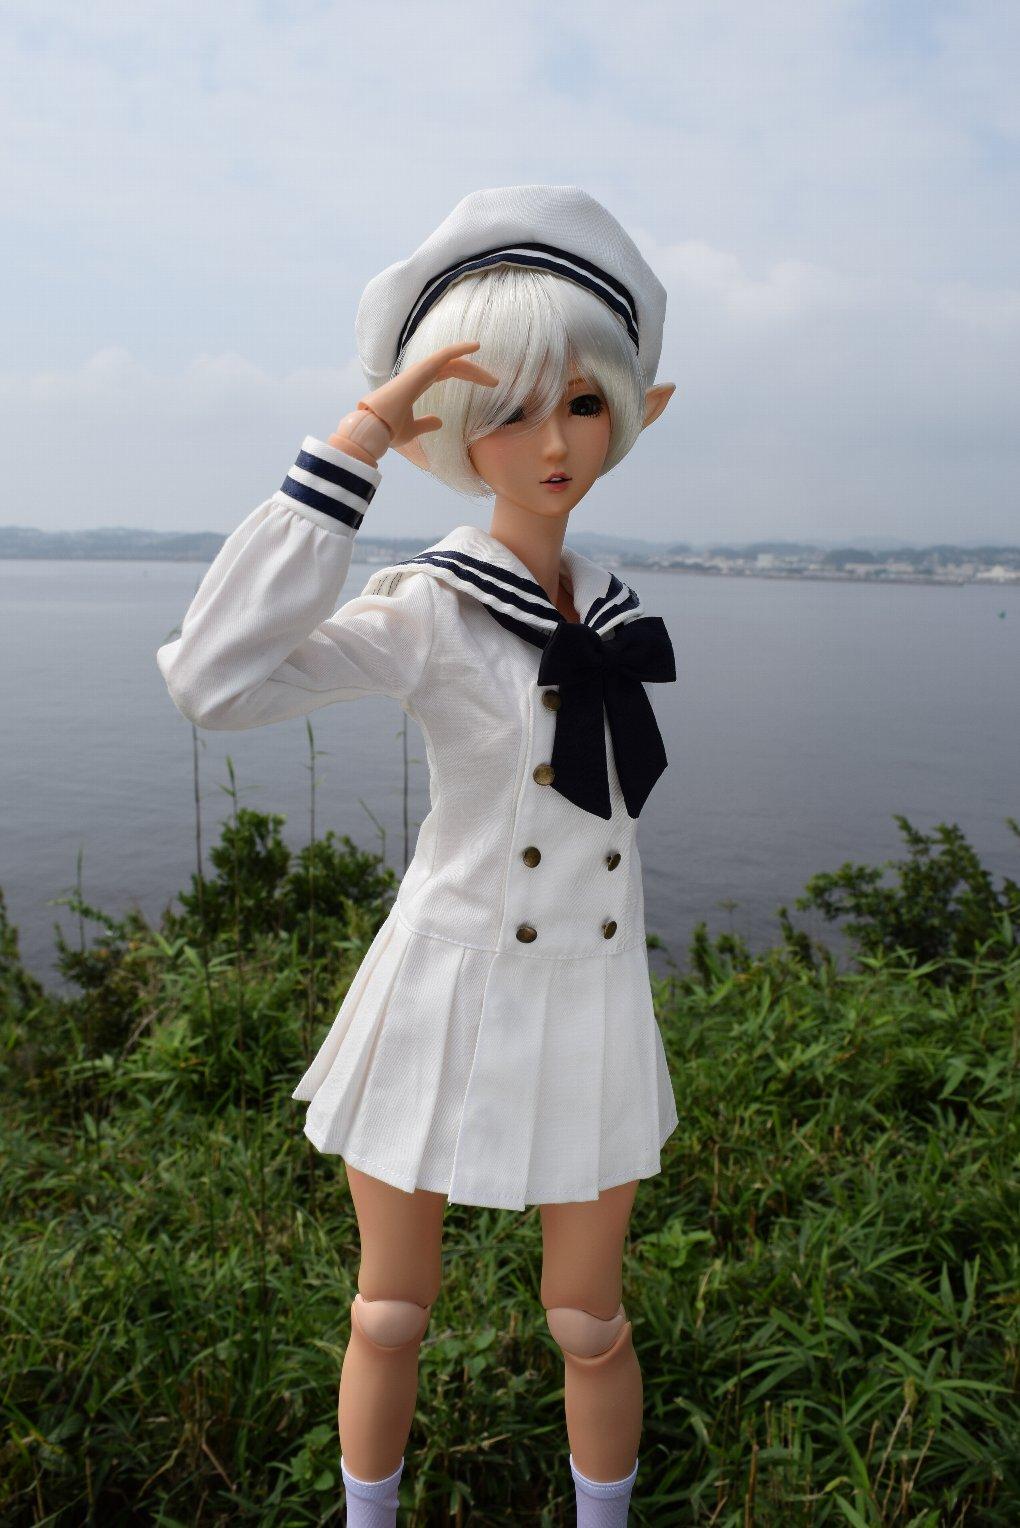 doll_3641.jpg